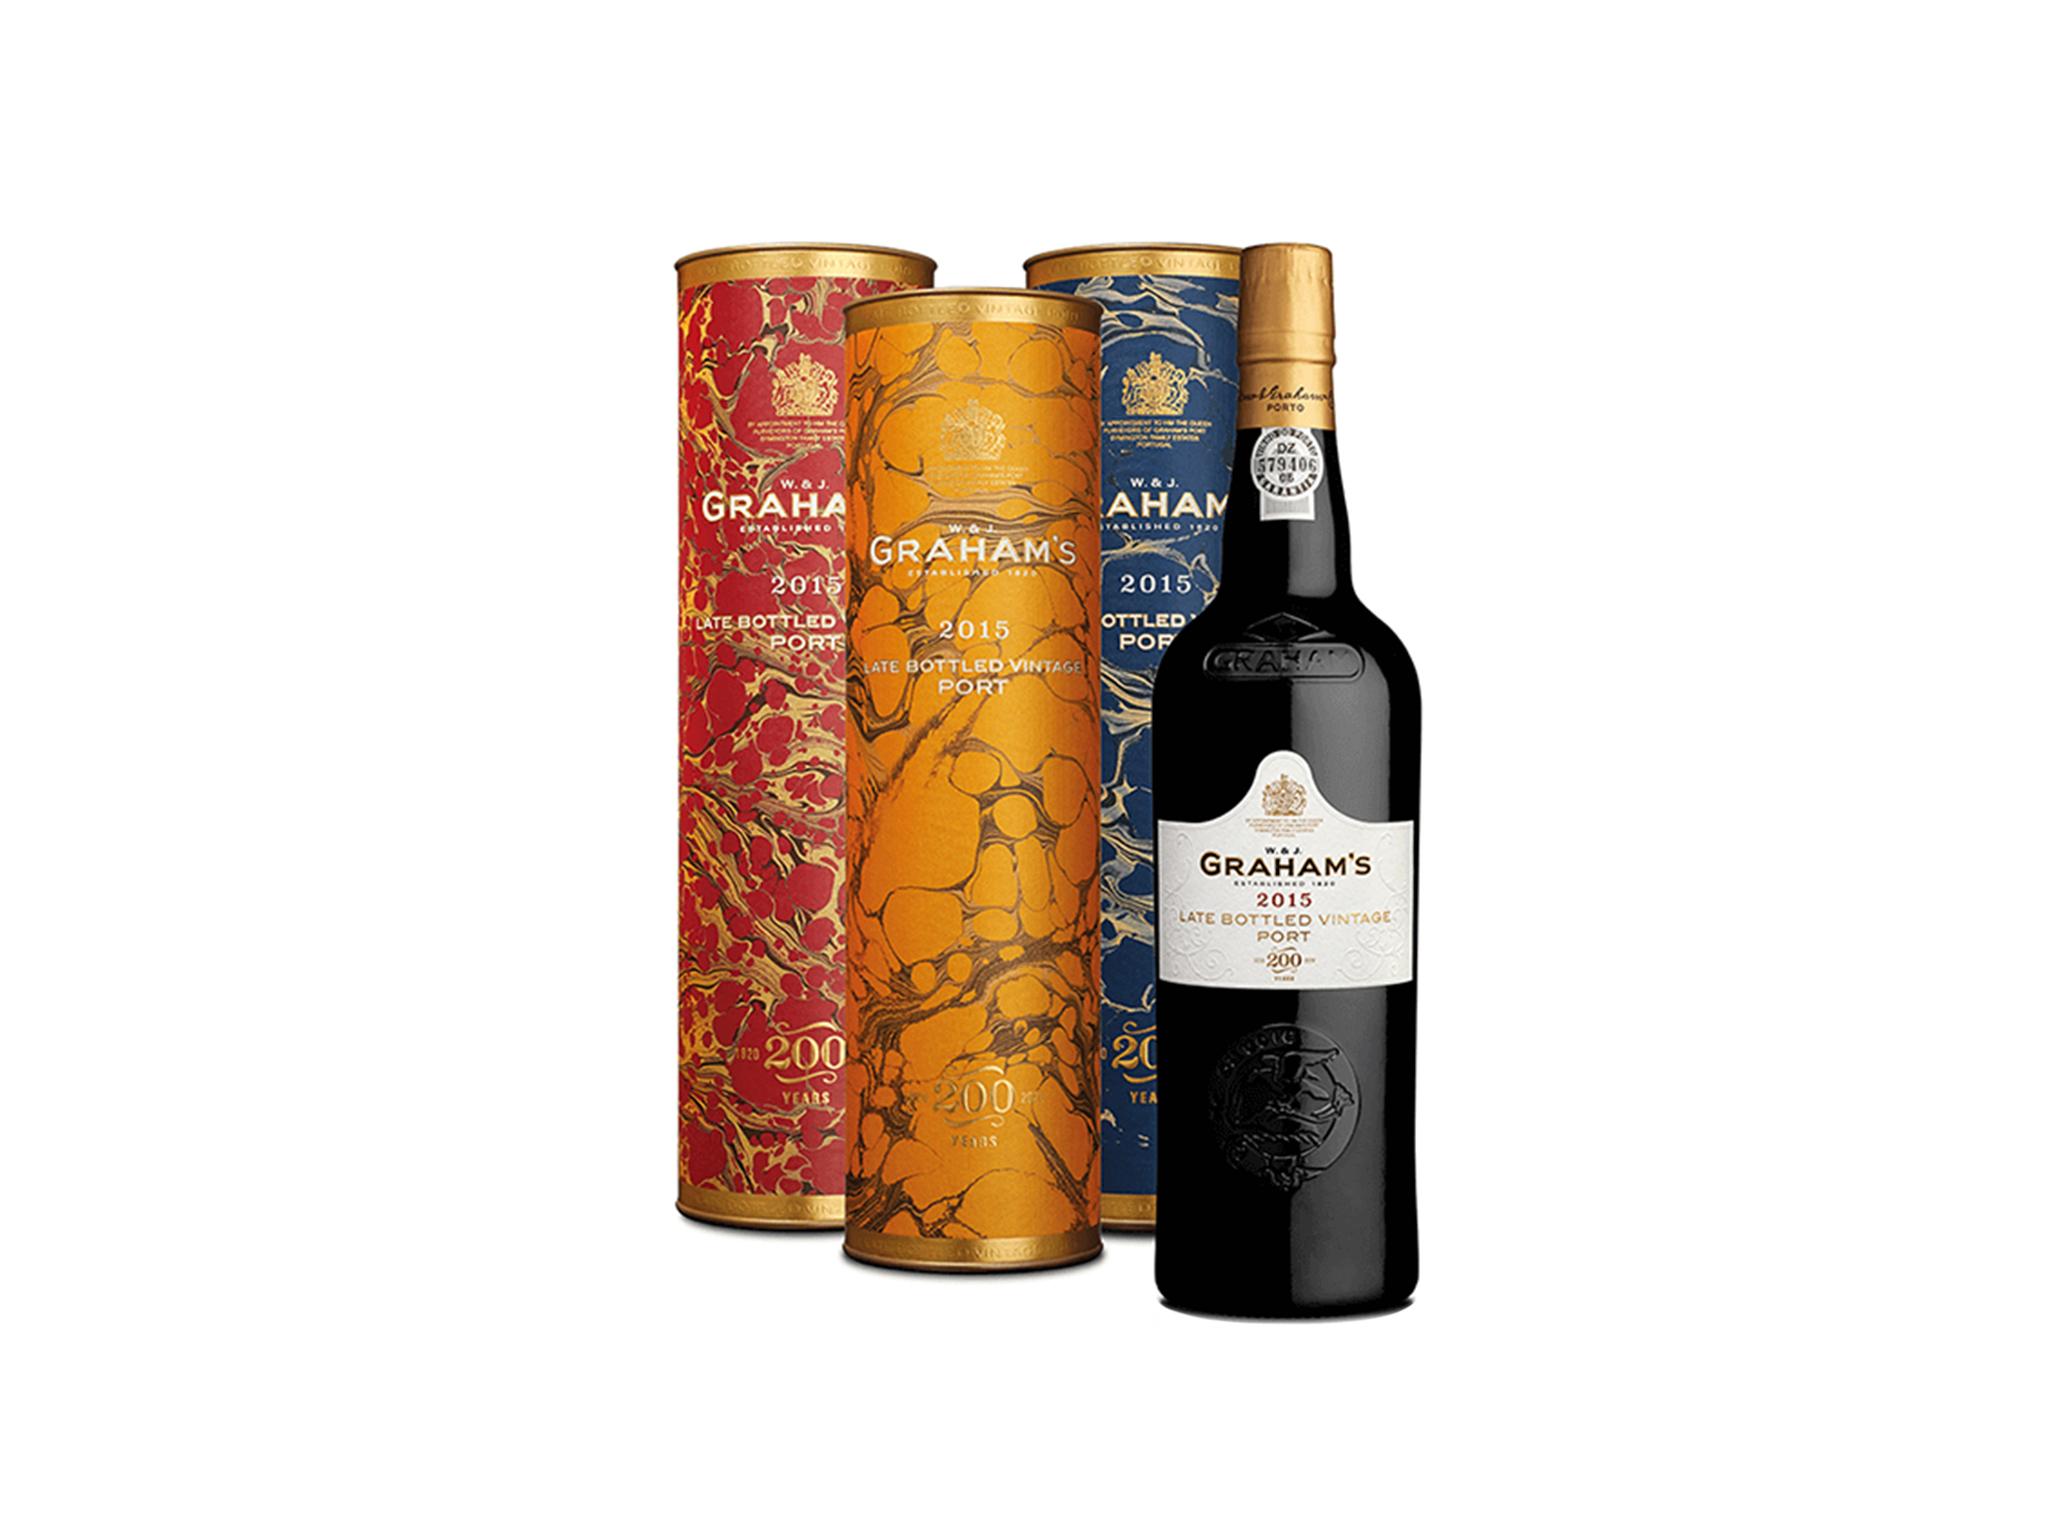 Shopping Natal, Vinhos, Graham's, Late Bottled Vintage Port